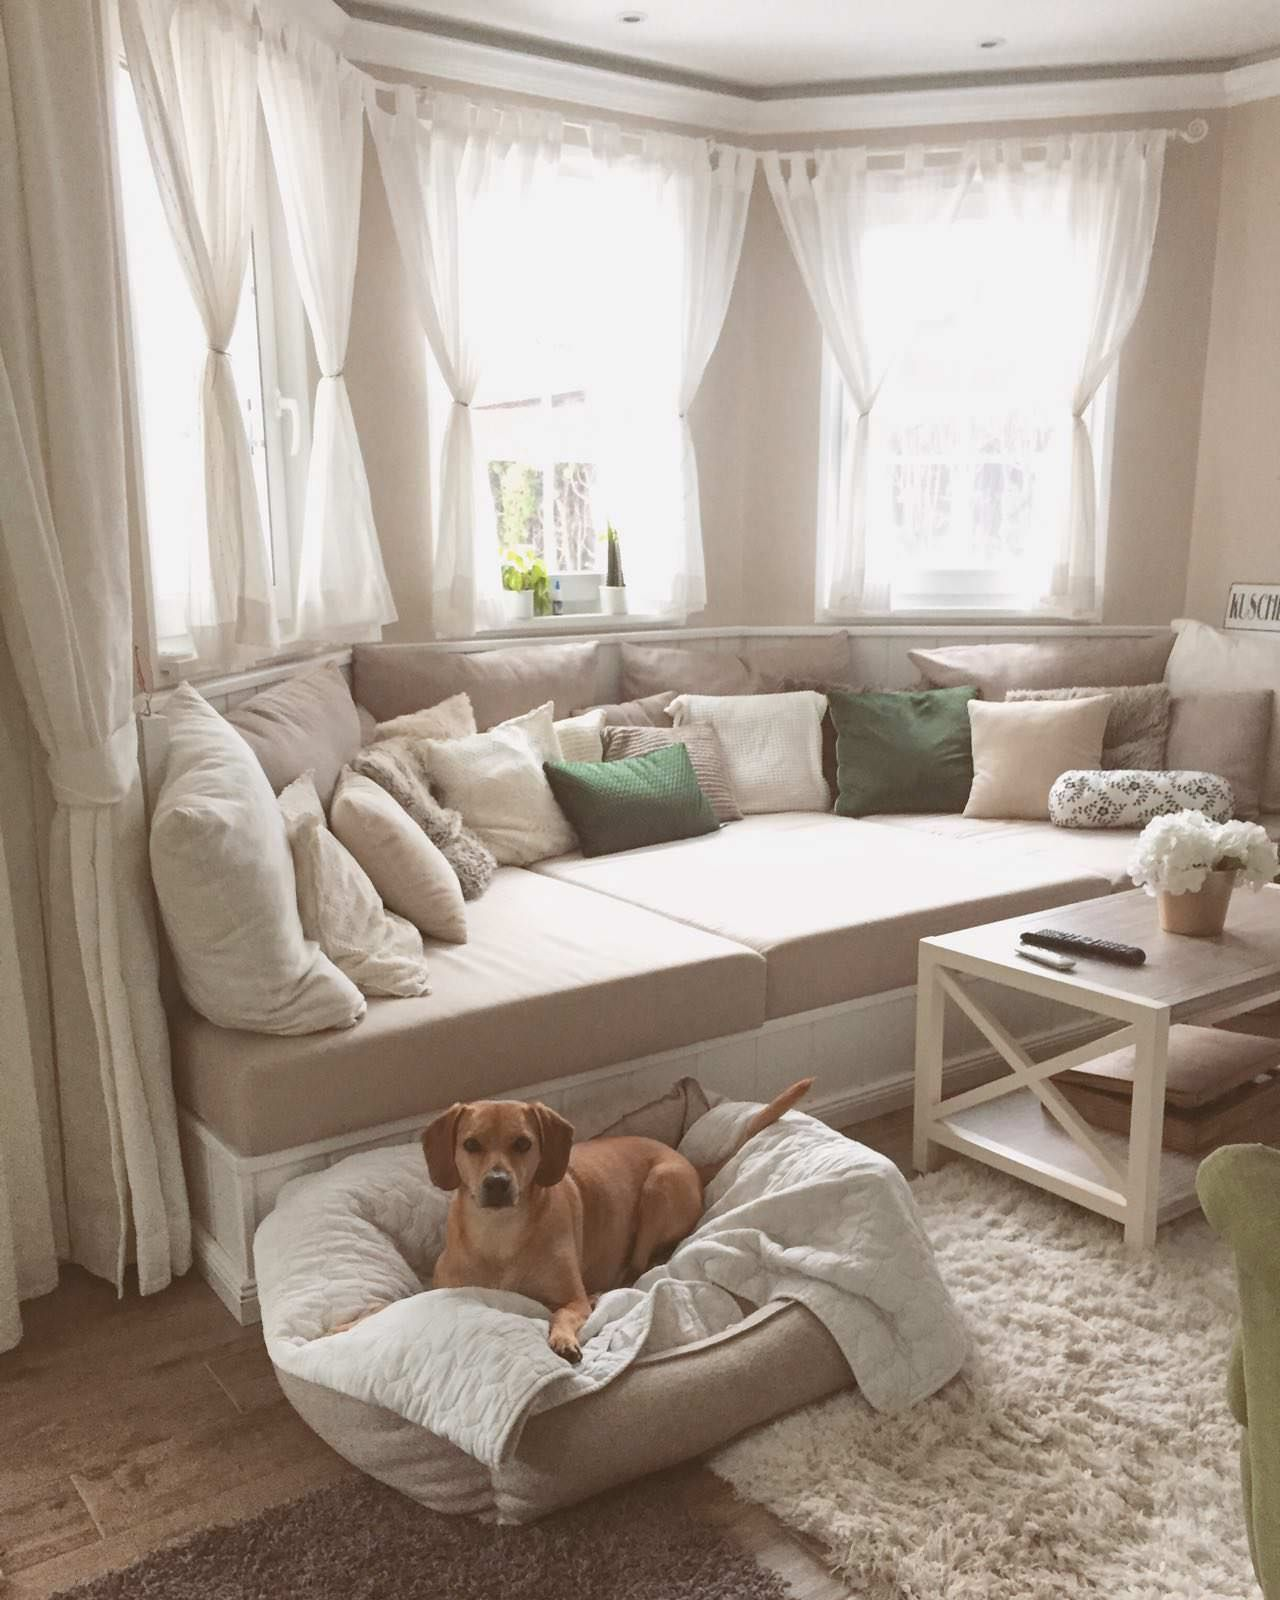 Small Mansion Floor Plan Interior Album On Imgur Livingroom Layout Living Room Remodel Bay Window Living Room